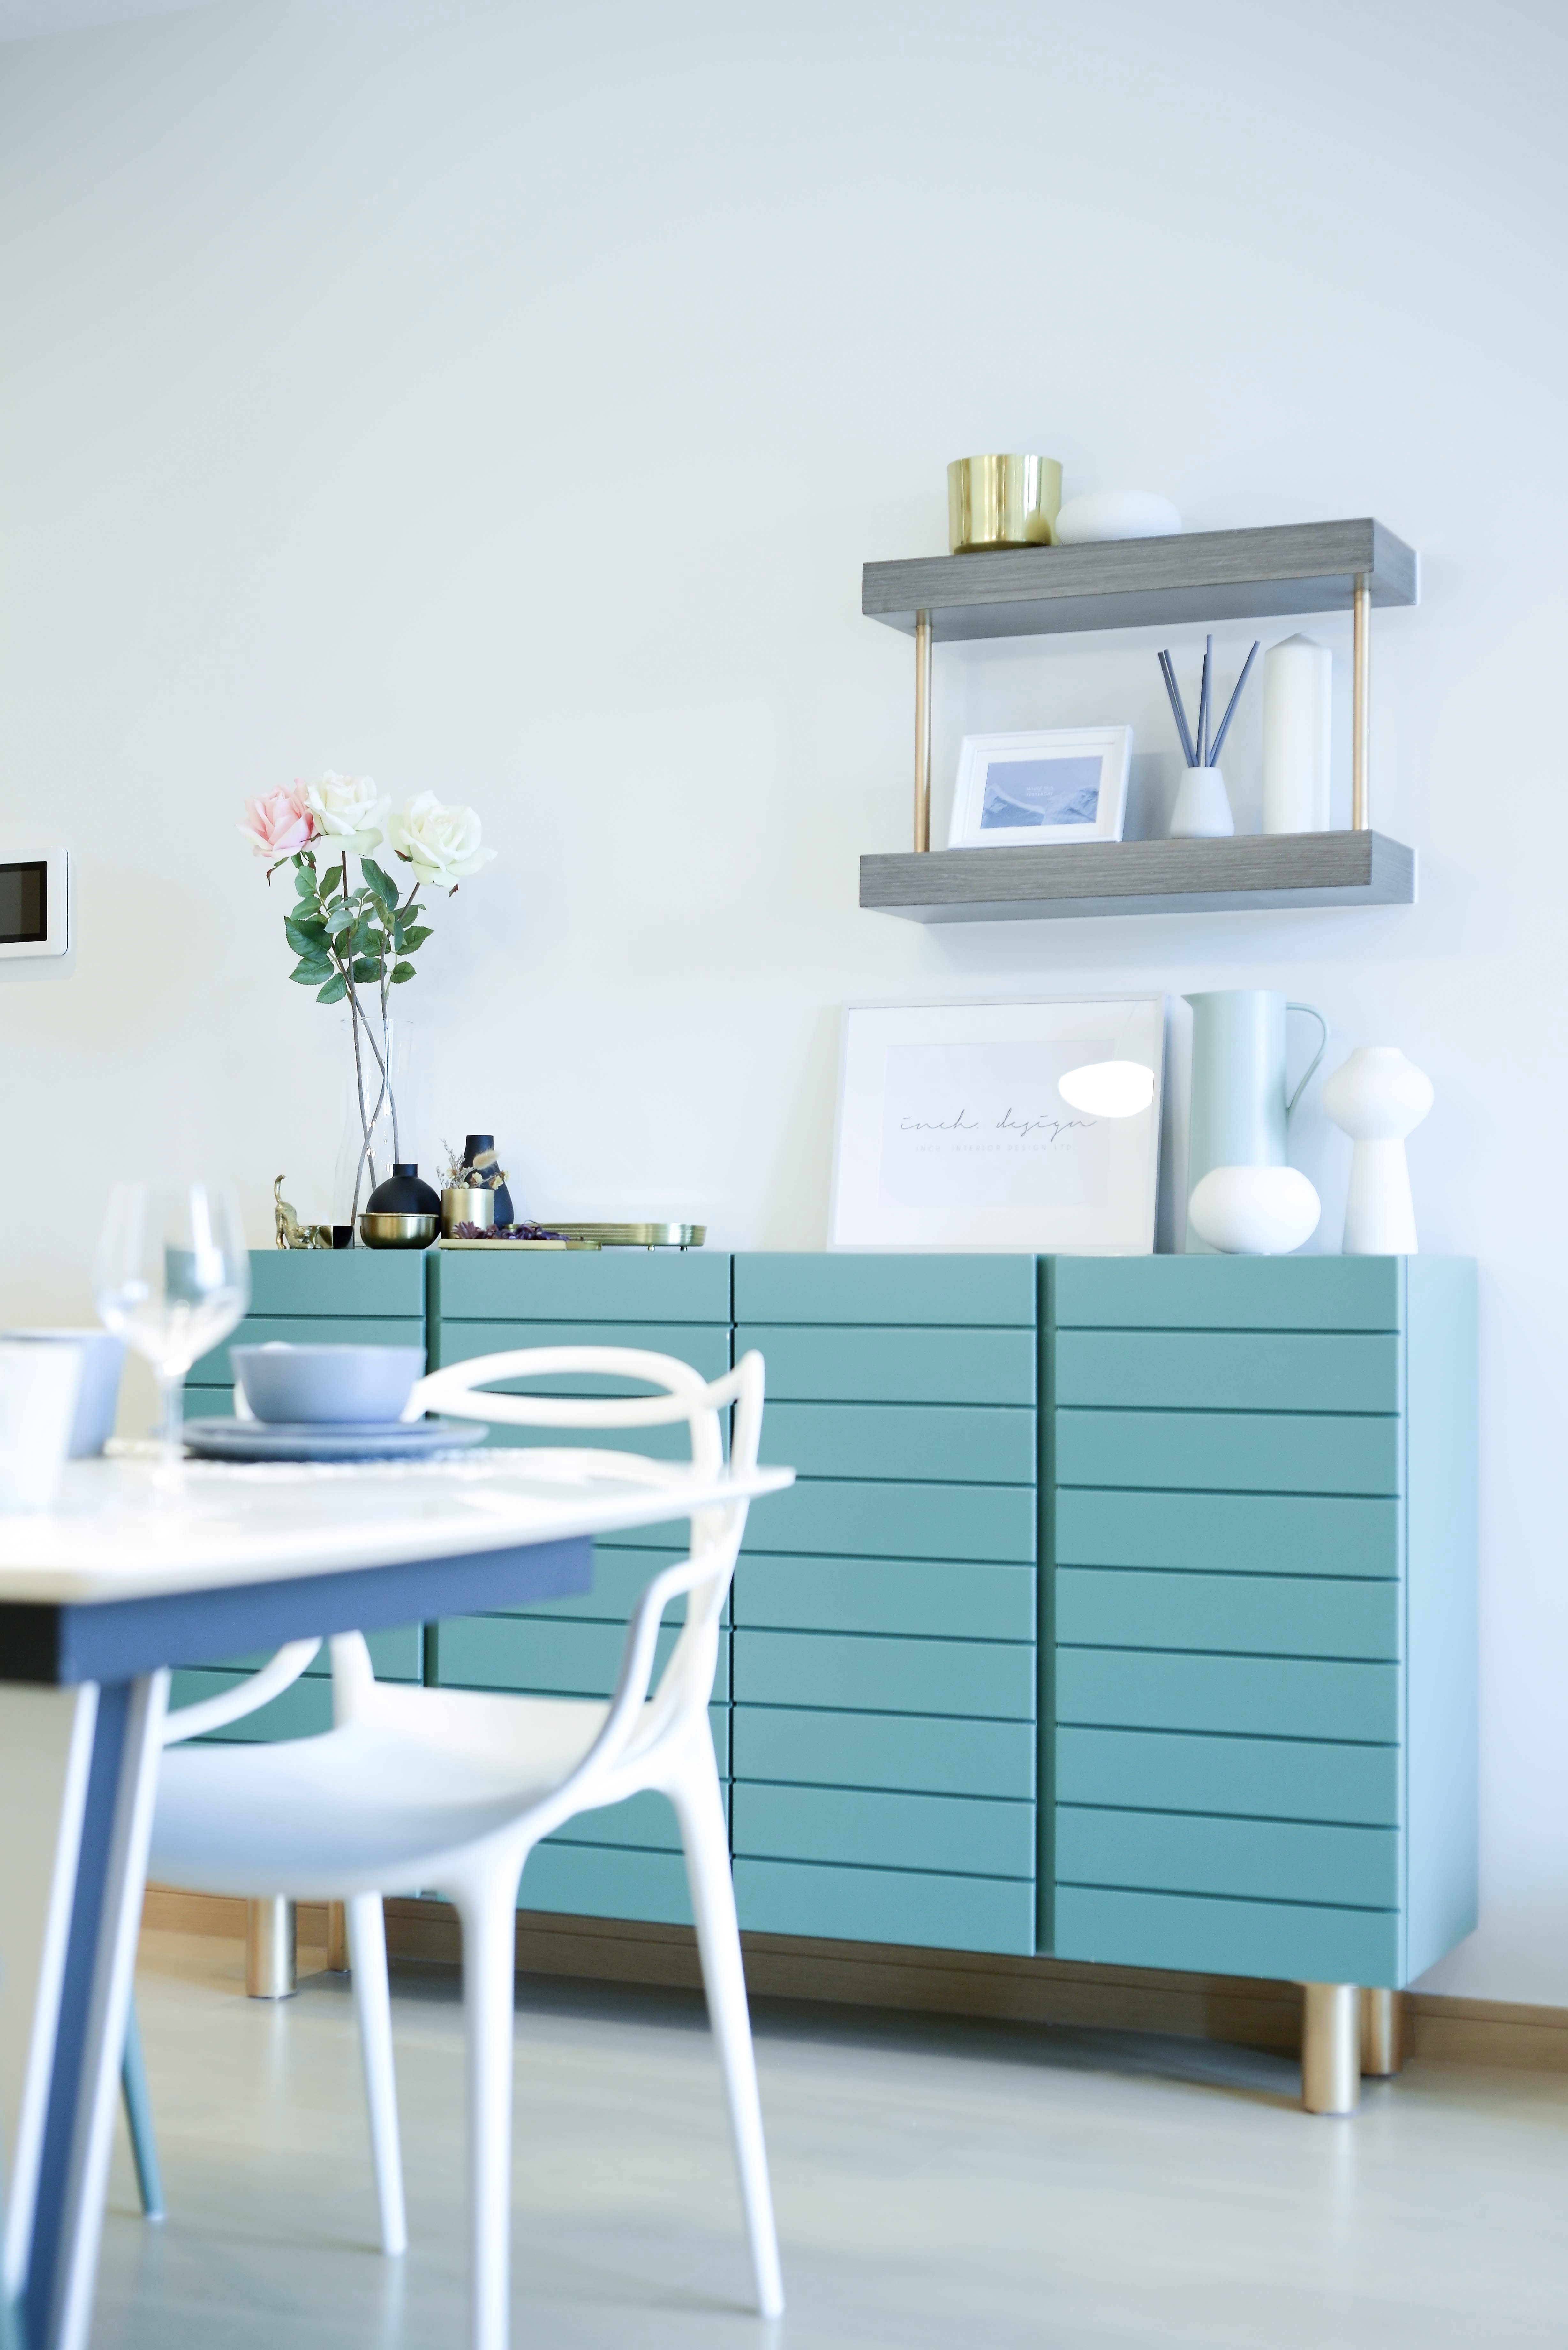 inch interior design hong kong our designs